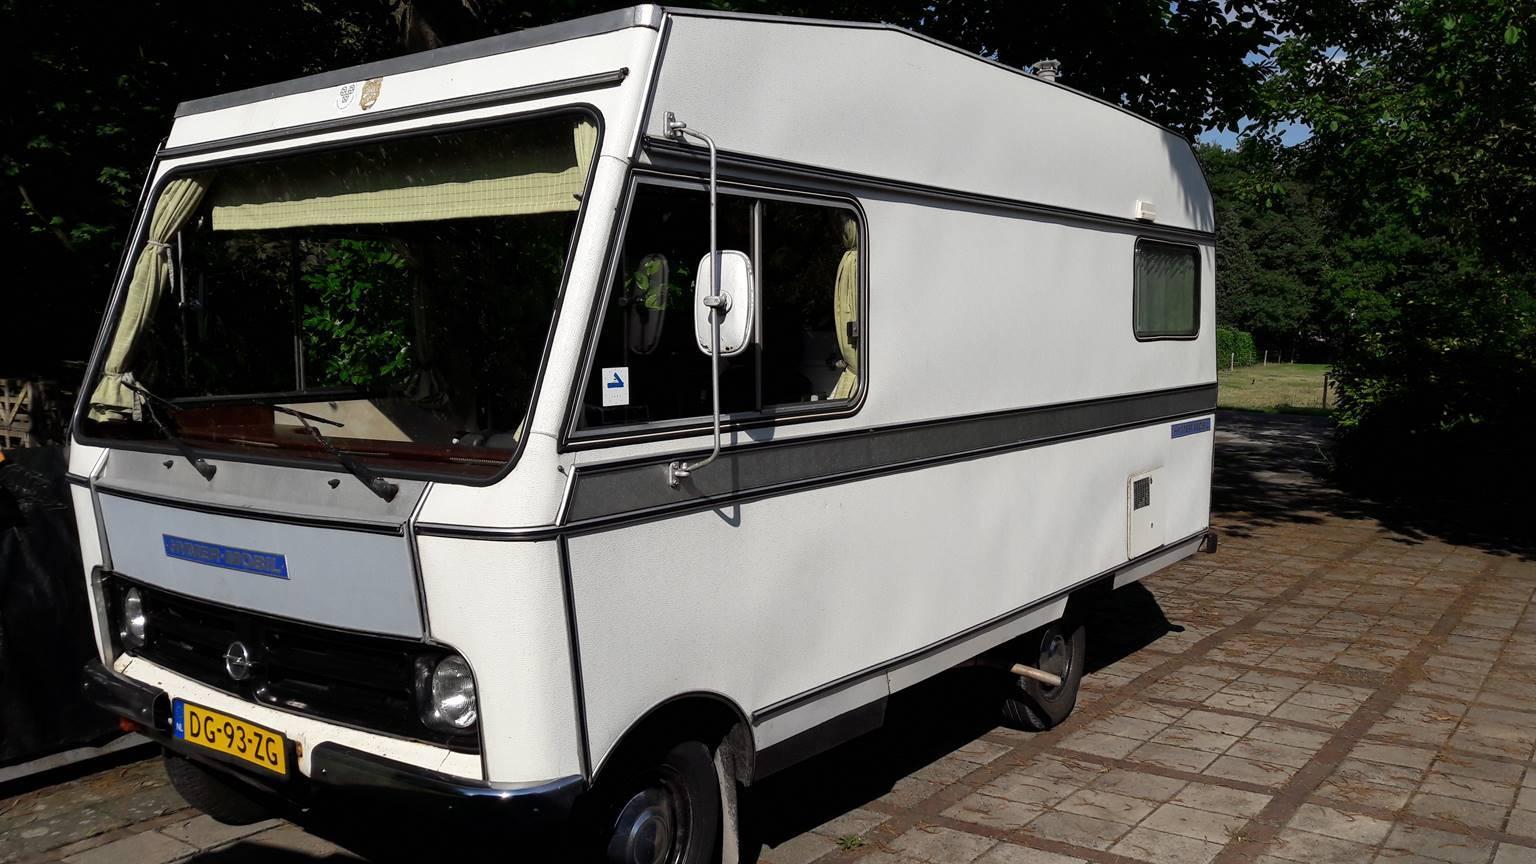 Uitzonderlijk Te koop: 4-persoons camper Hymer Mobile - Bedford - Bedford #ZR39